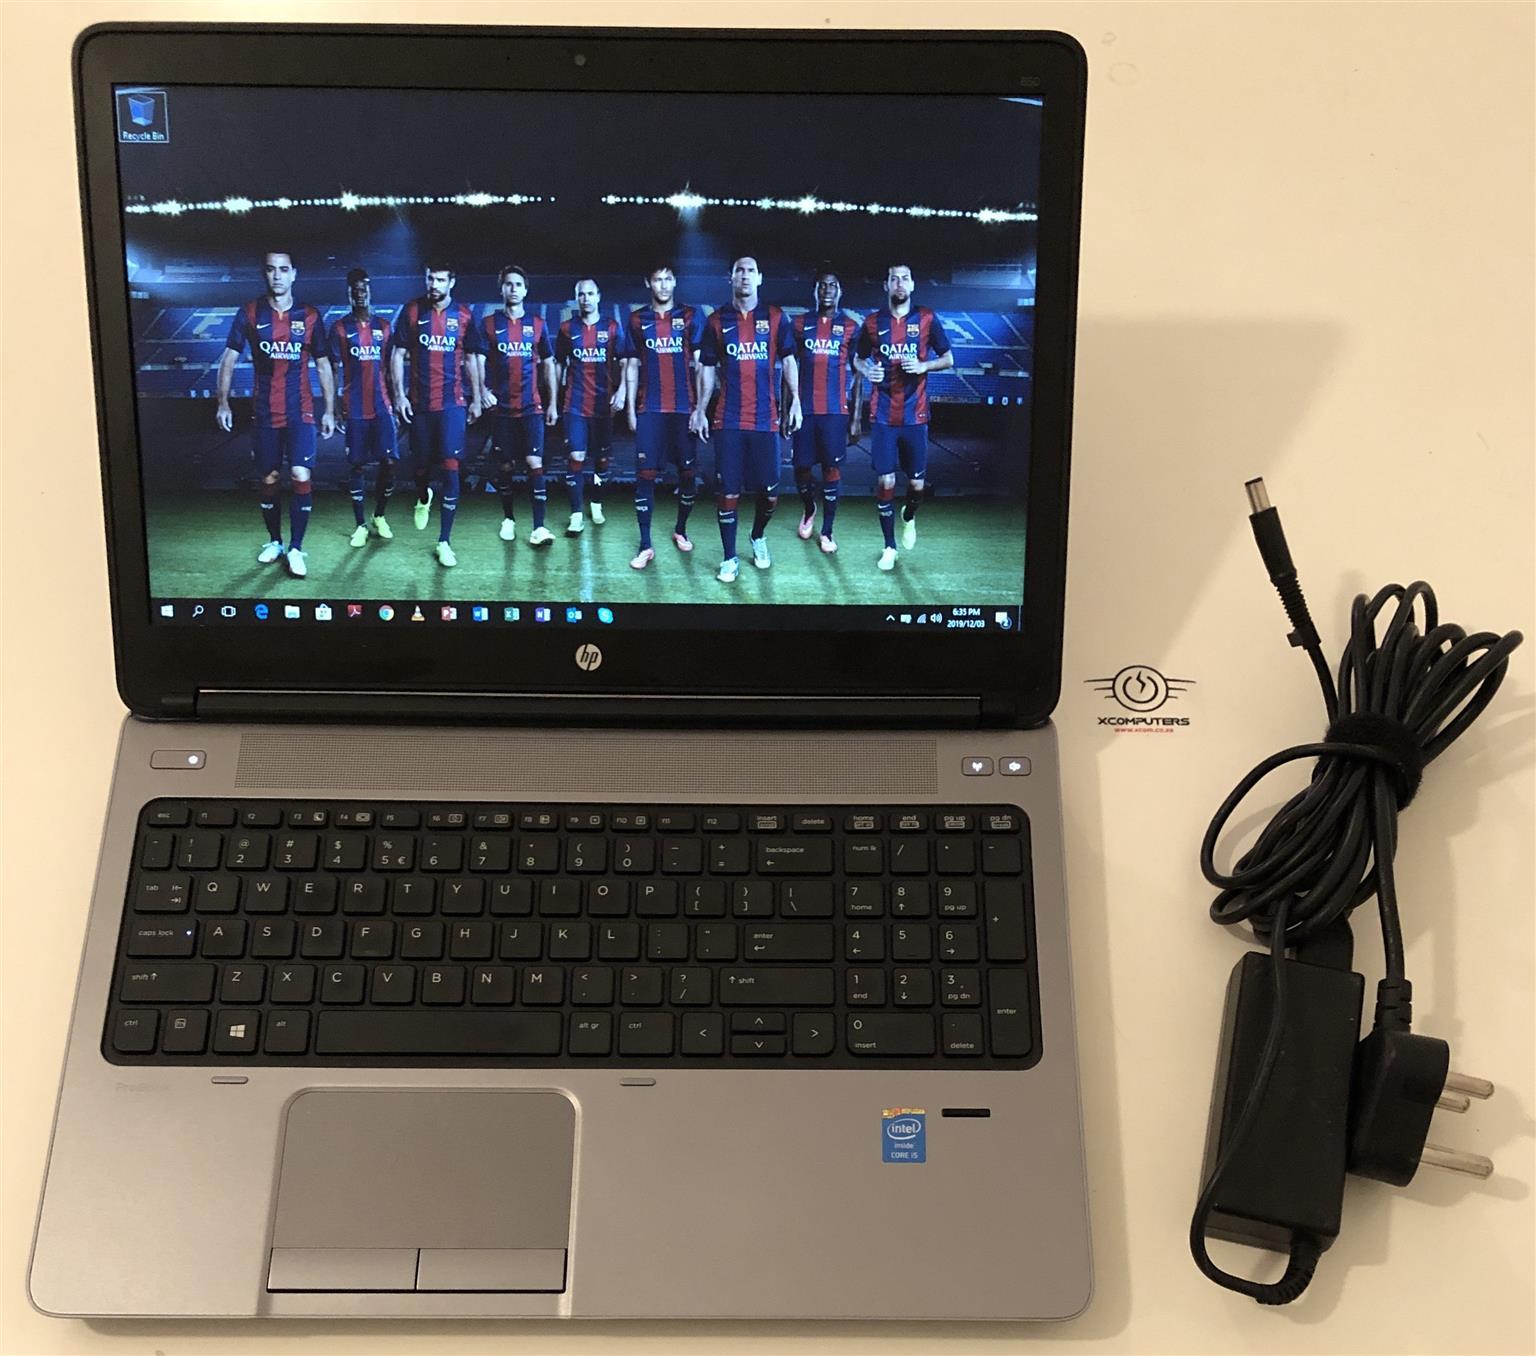 Core i5 HP650 Intel 4th Generation Laptop